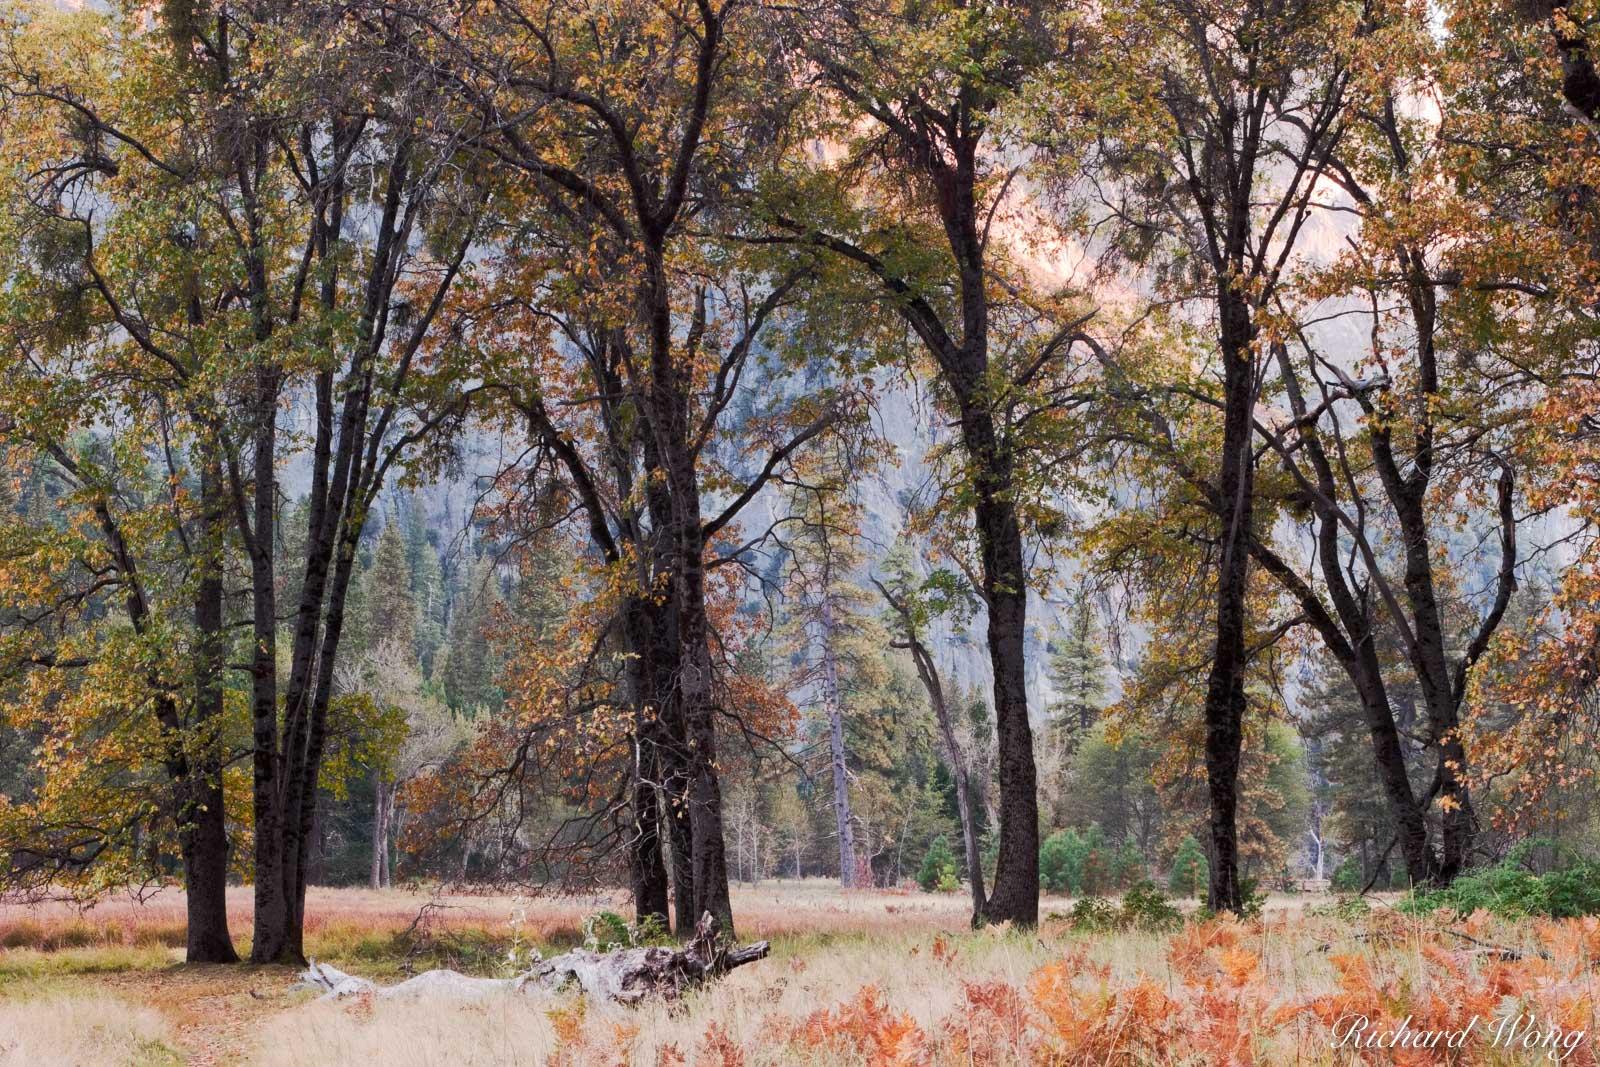 Cook's Meadow Oak Trees in Fall, Yosemite National Park, California